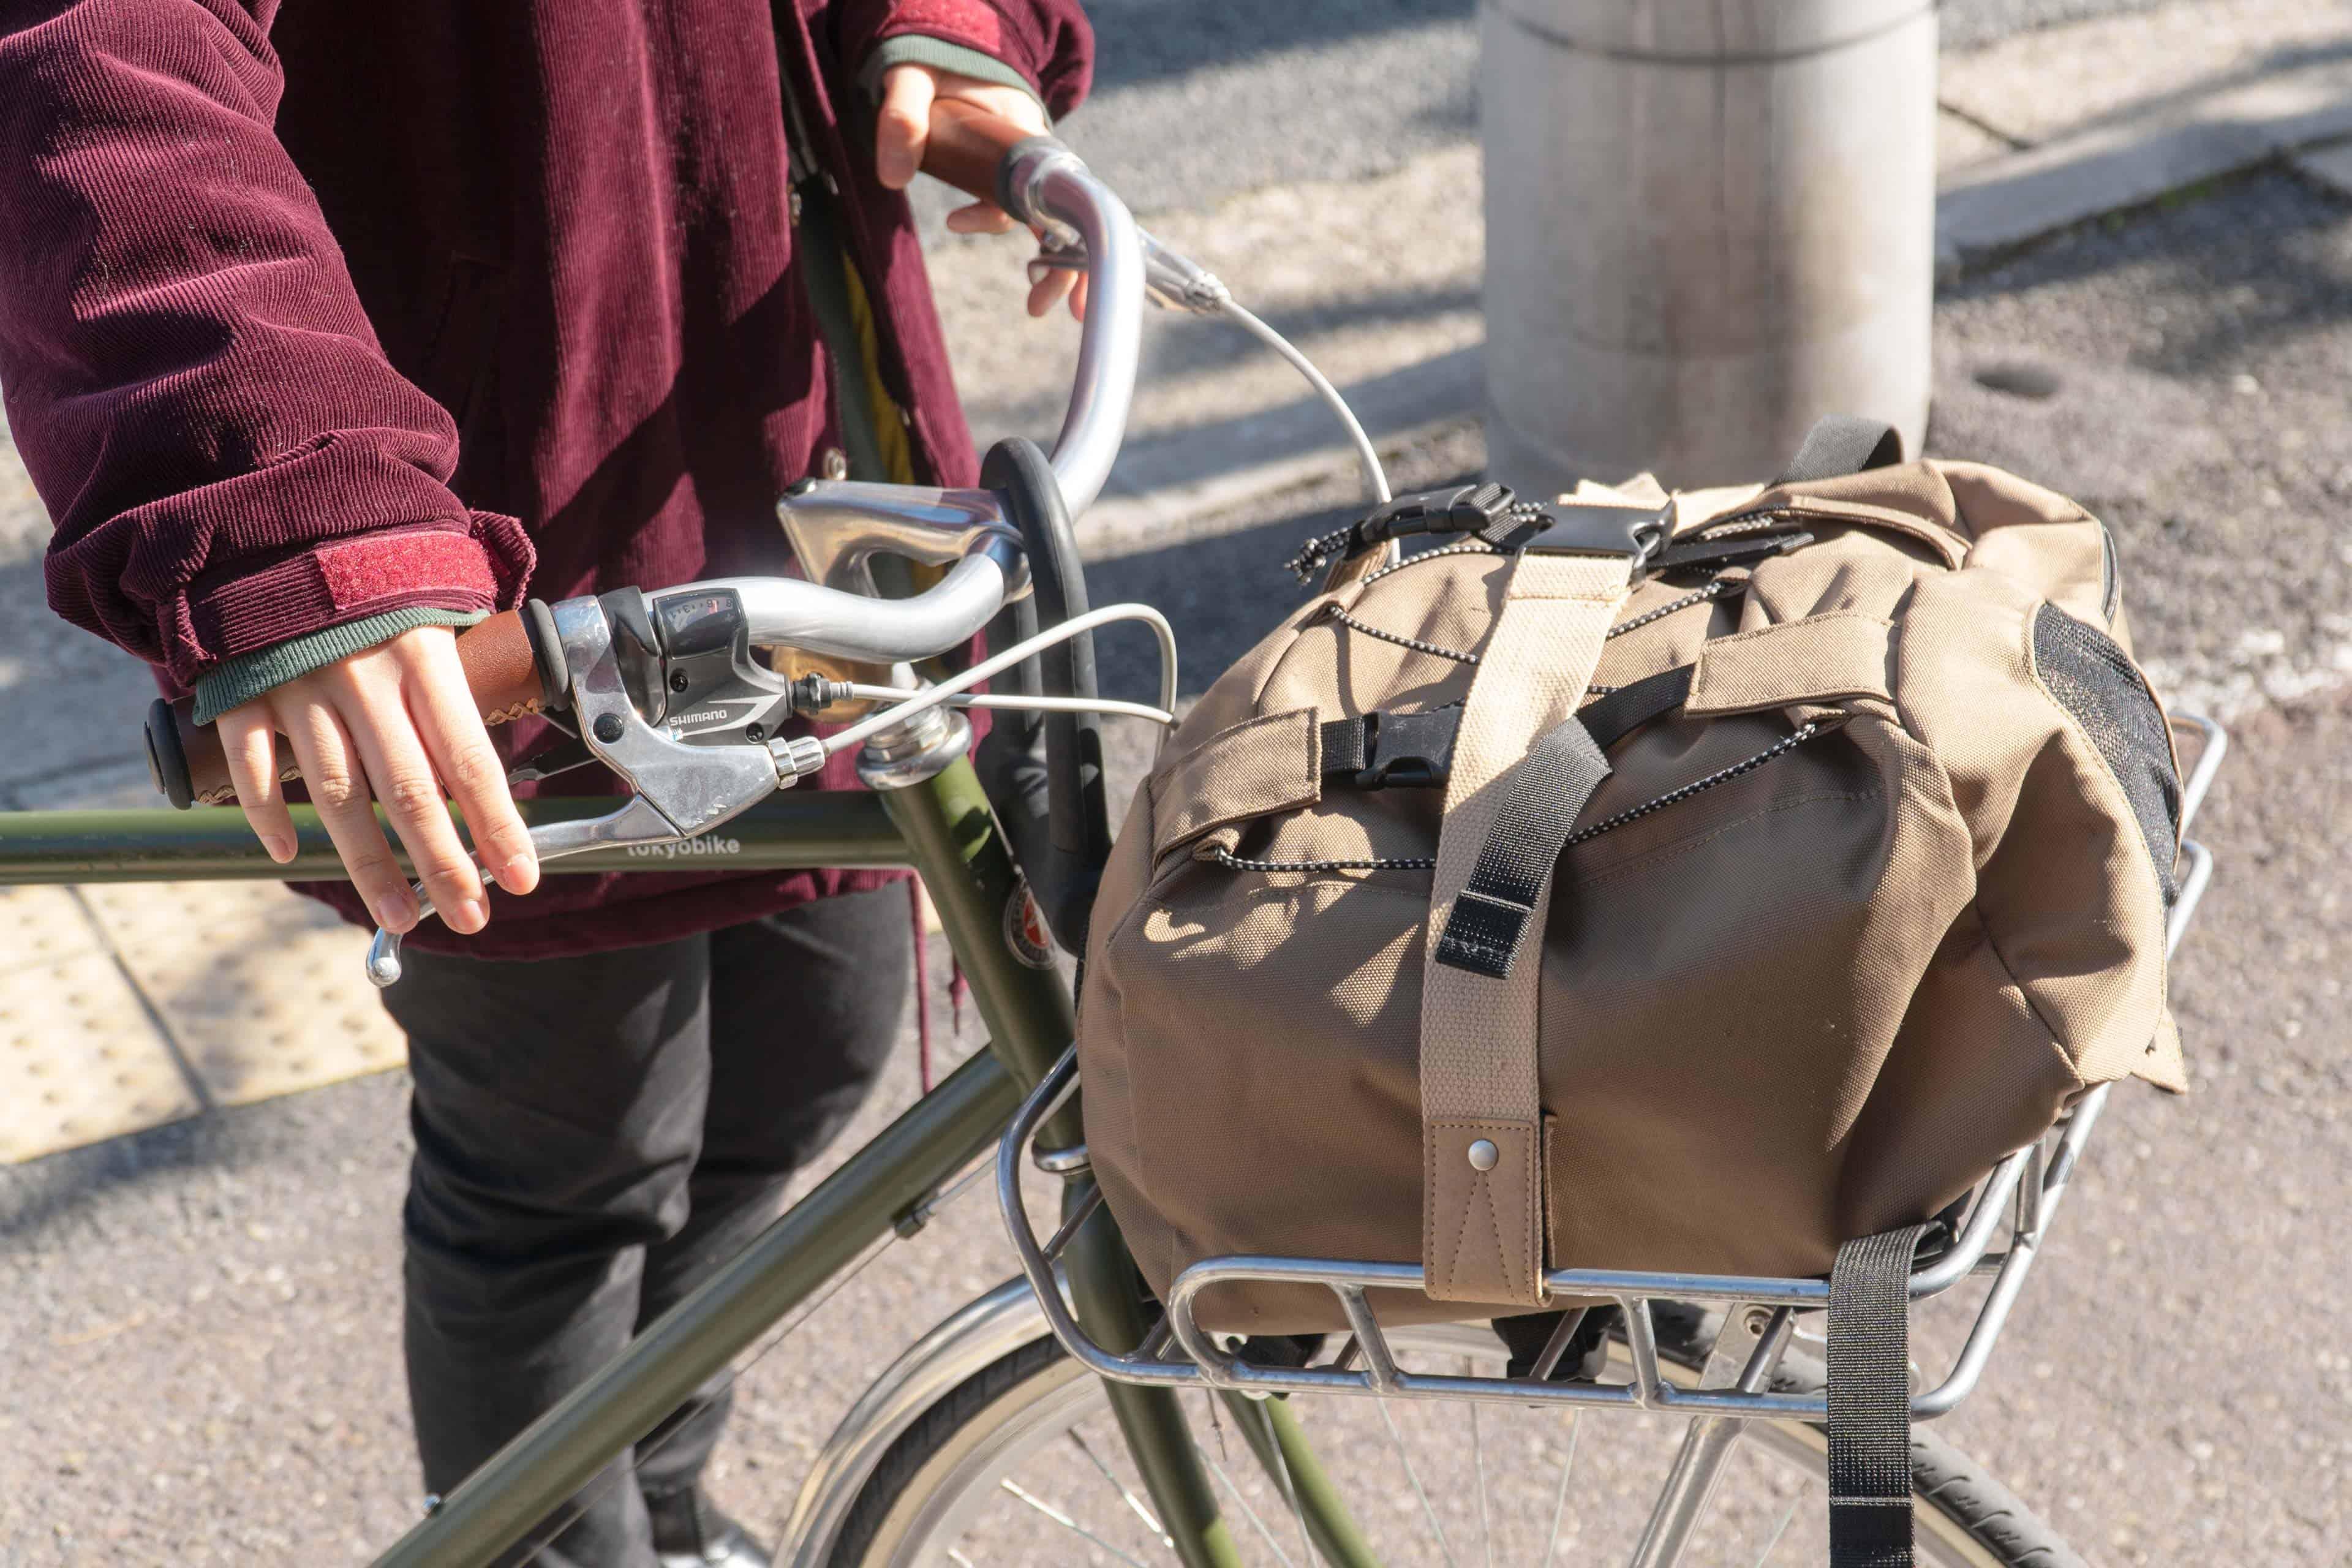 tokyobike 26 モスグリーン カスタム自転車 街乗り自転車 シティバイク クロスバイク